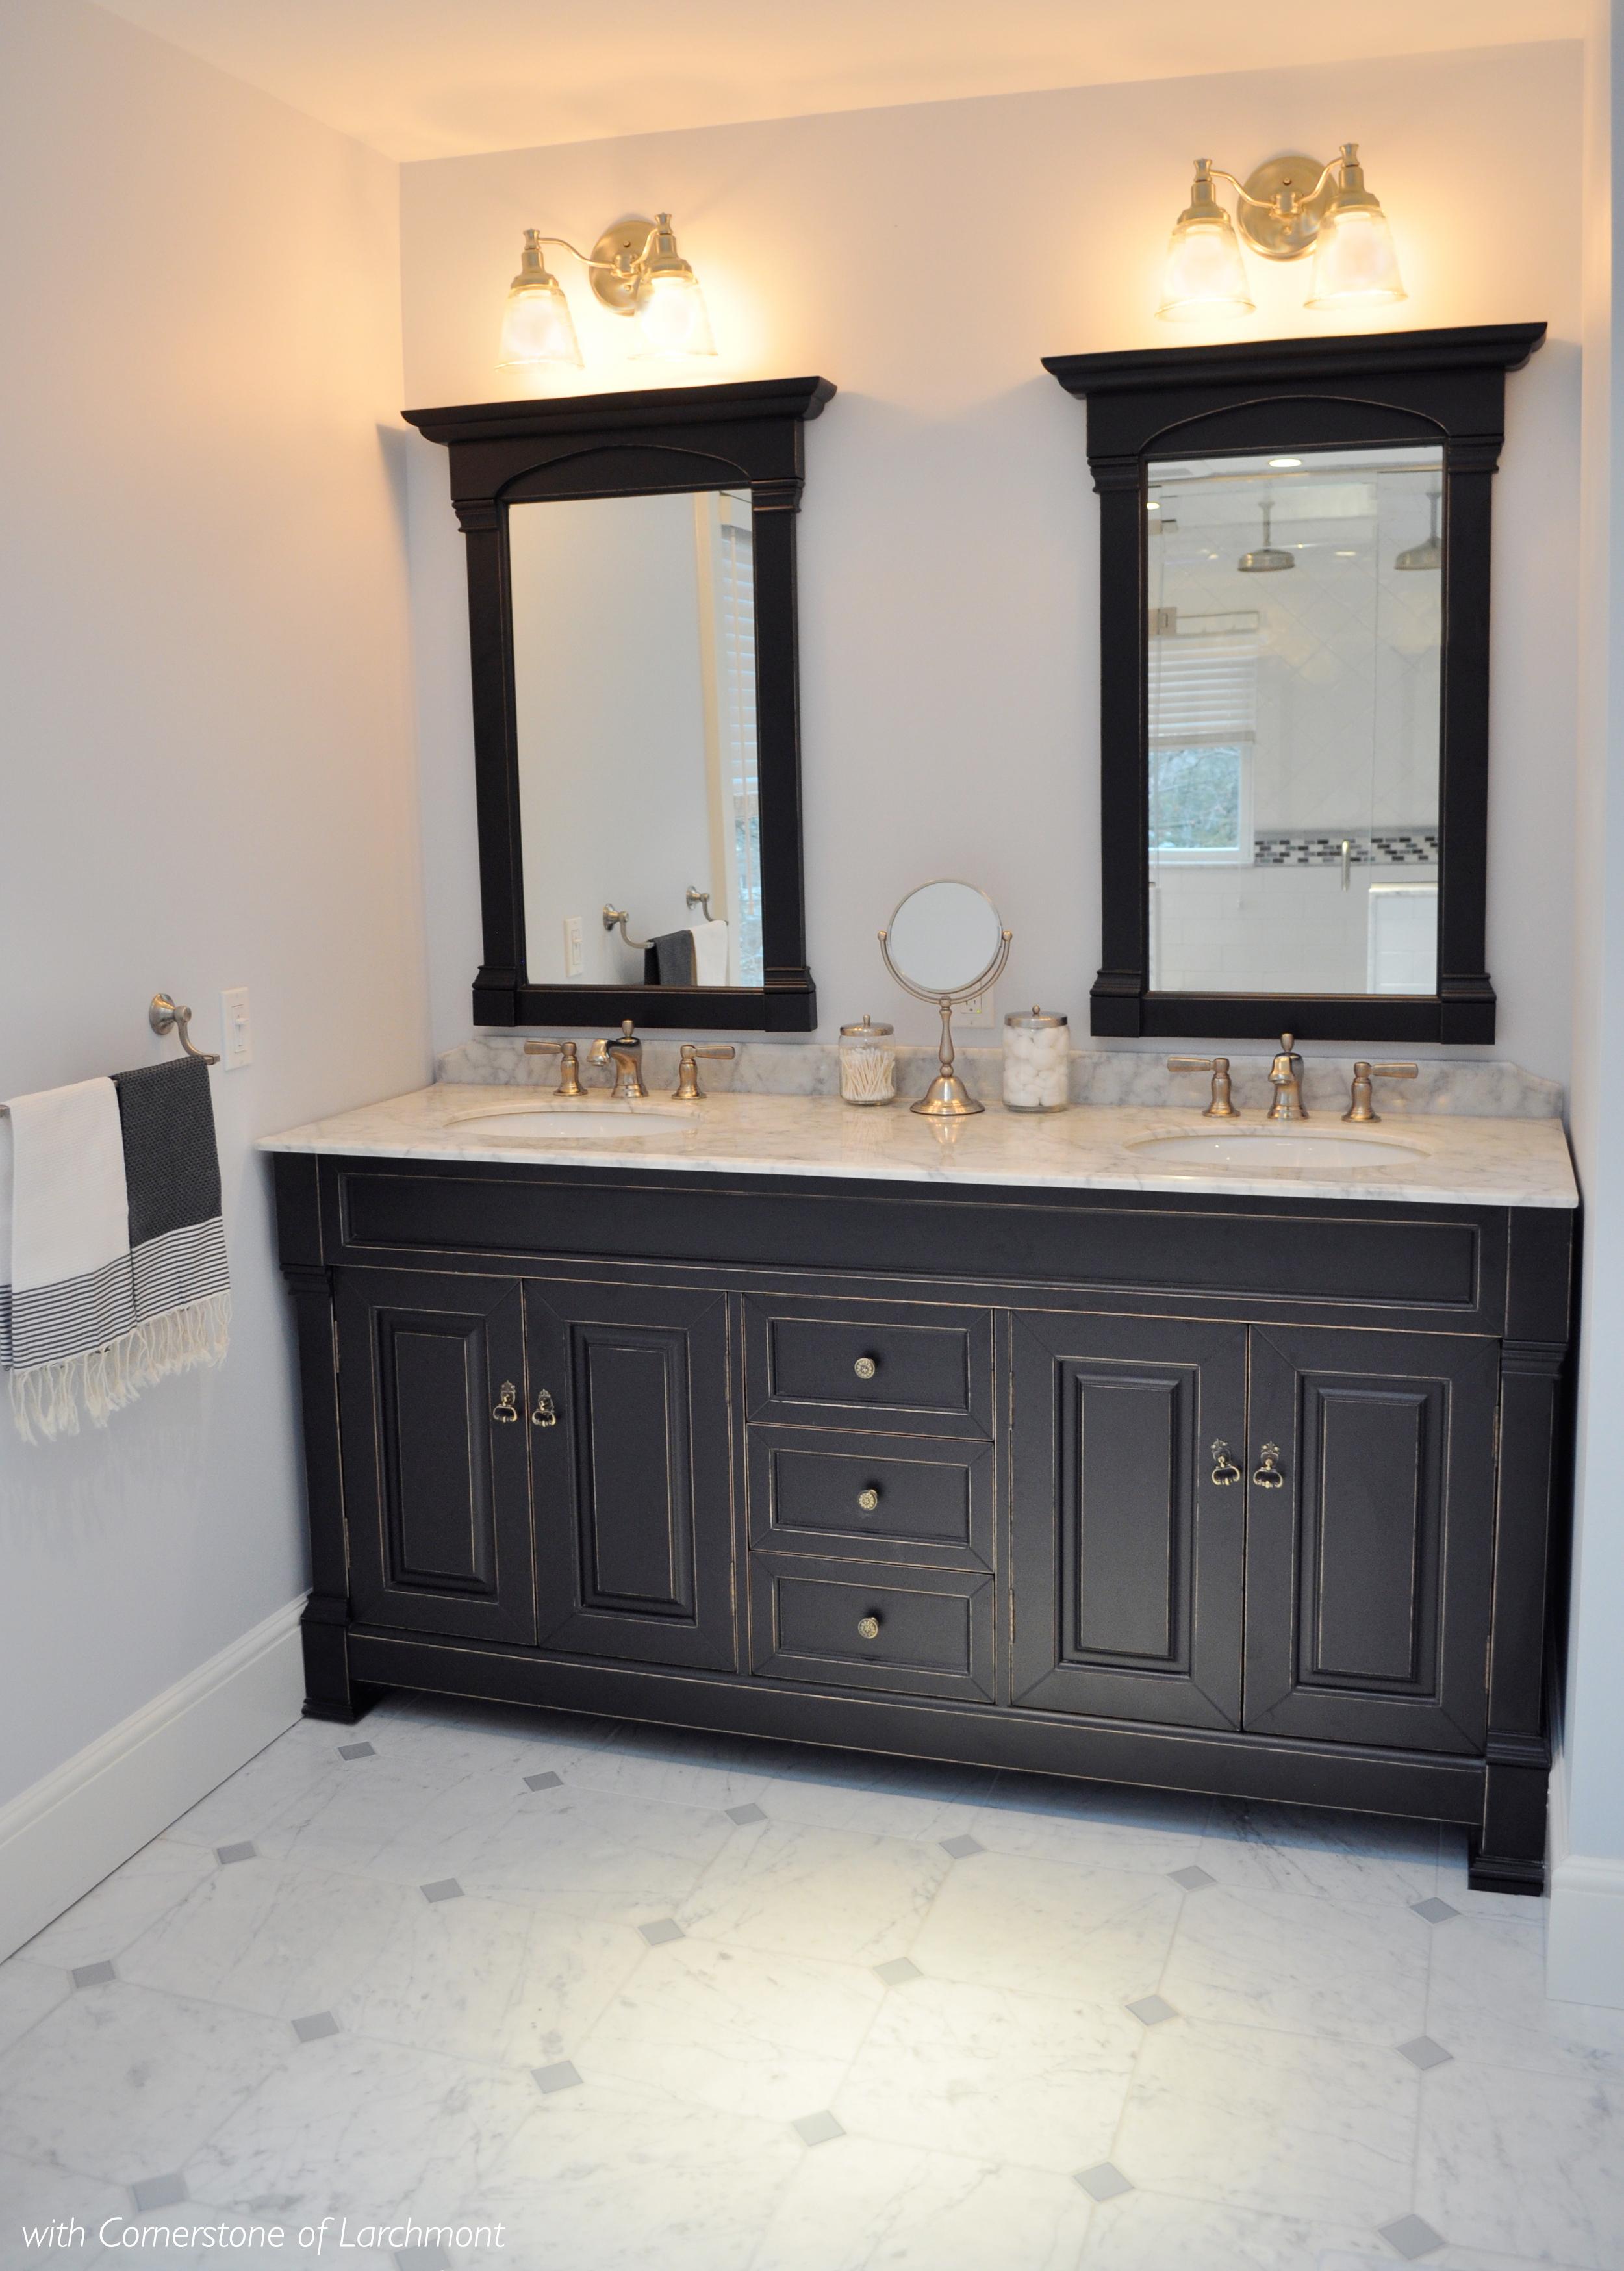 Kim Annick Mitchell_Interior Designer_Master Bathroom_Antique Black Double Vanity_Marble Tile Flooring.jpg